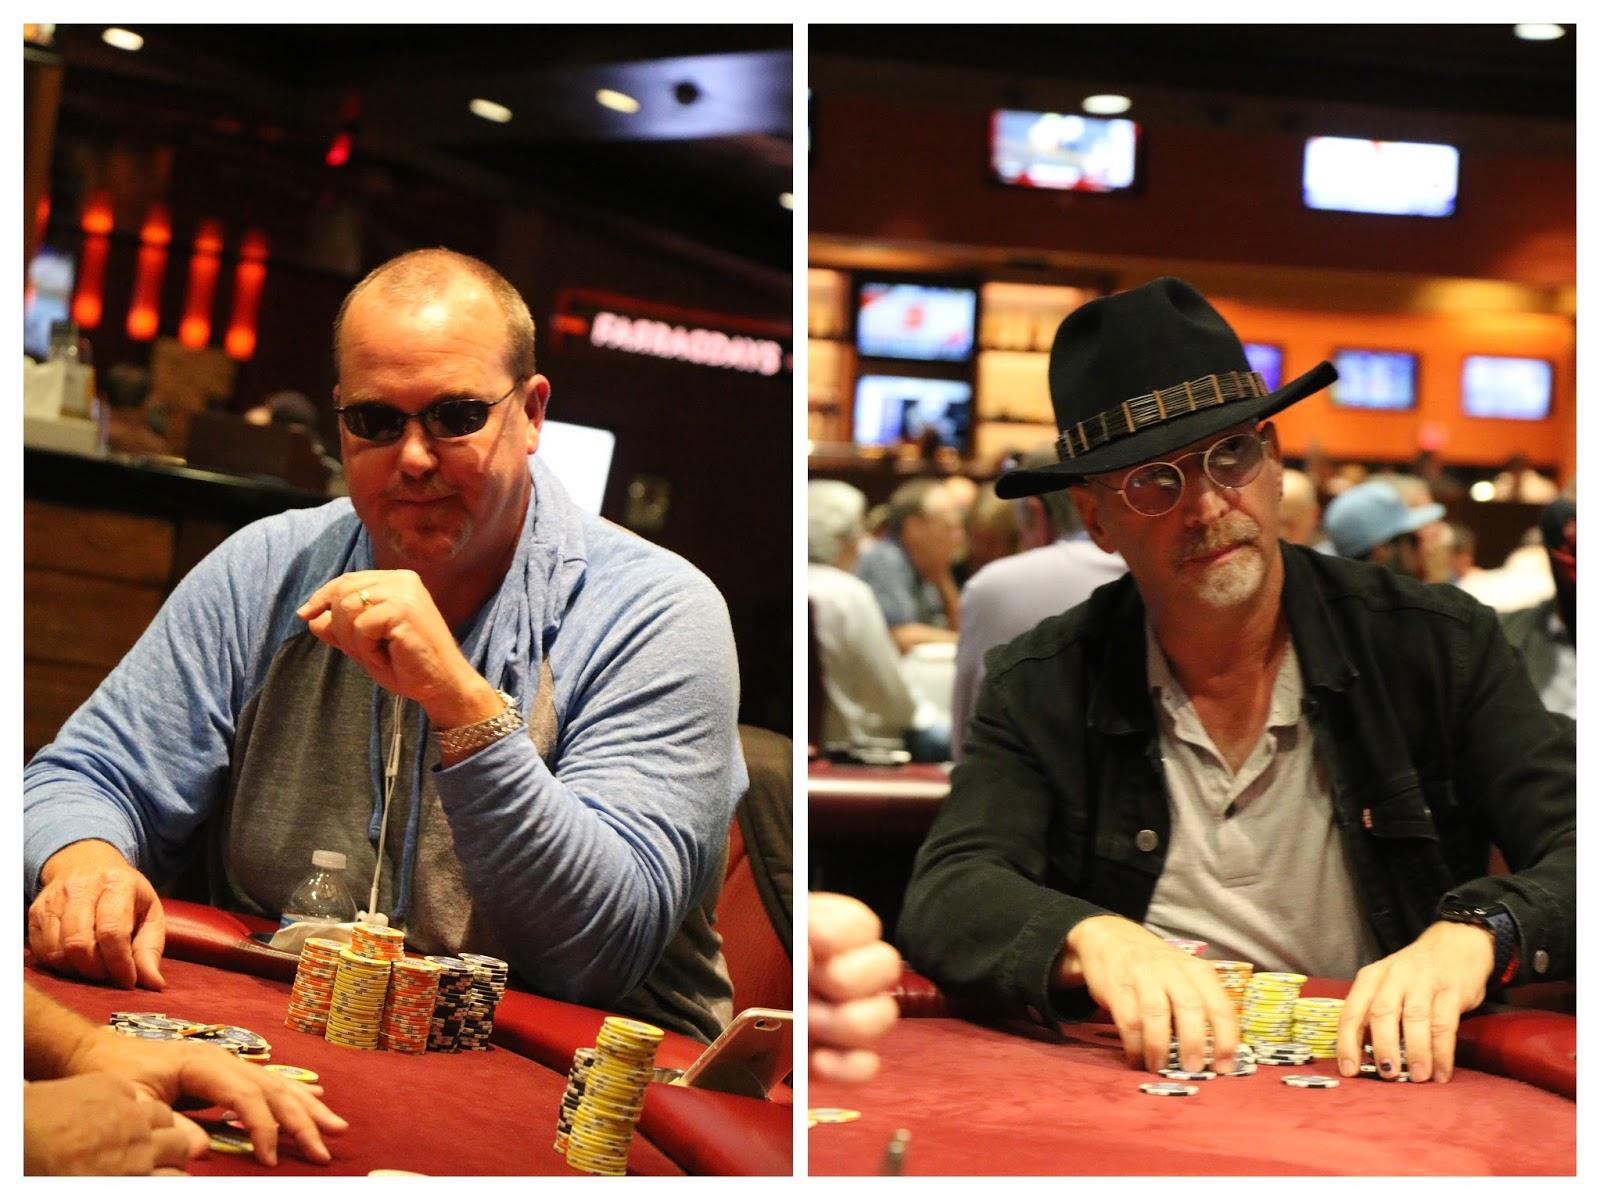 Alan saltzman poker juegos poker governor